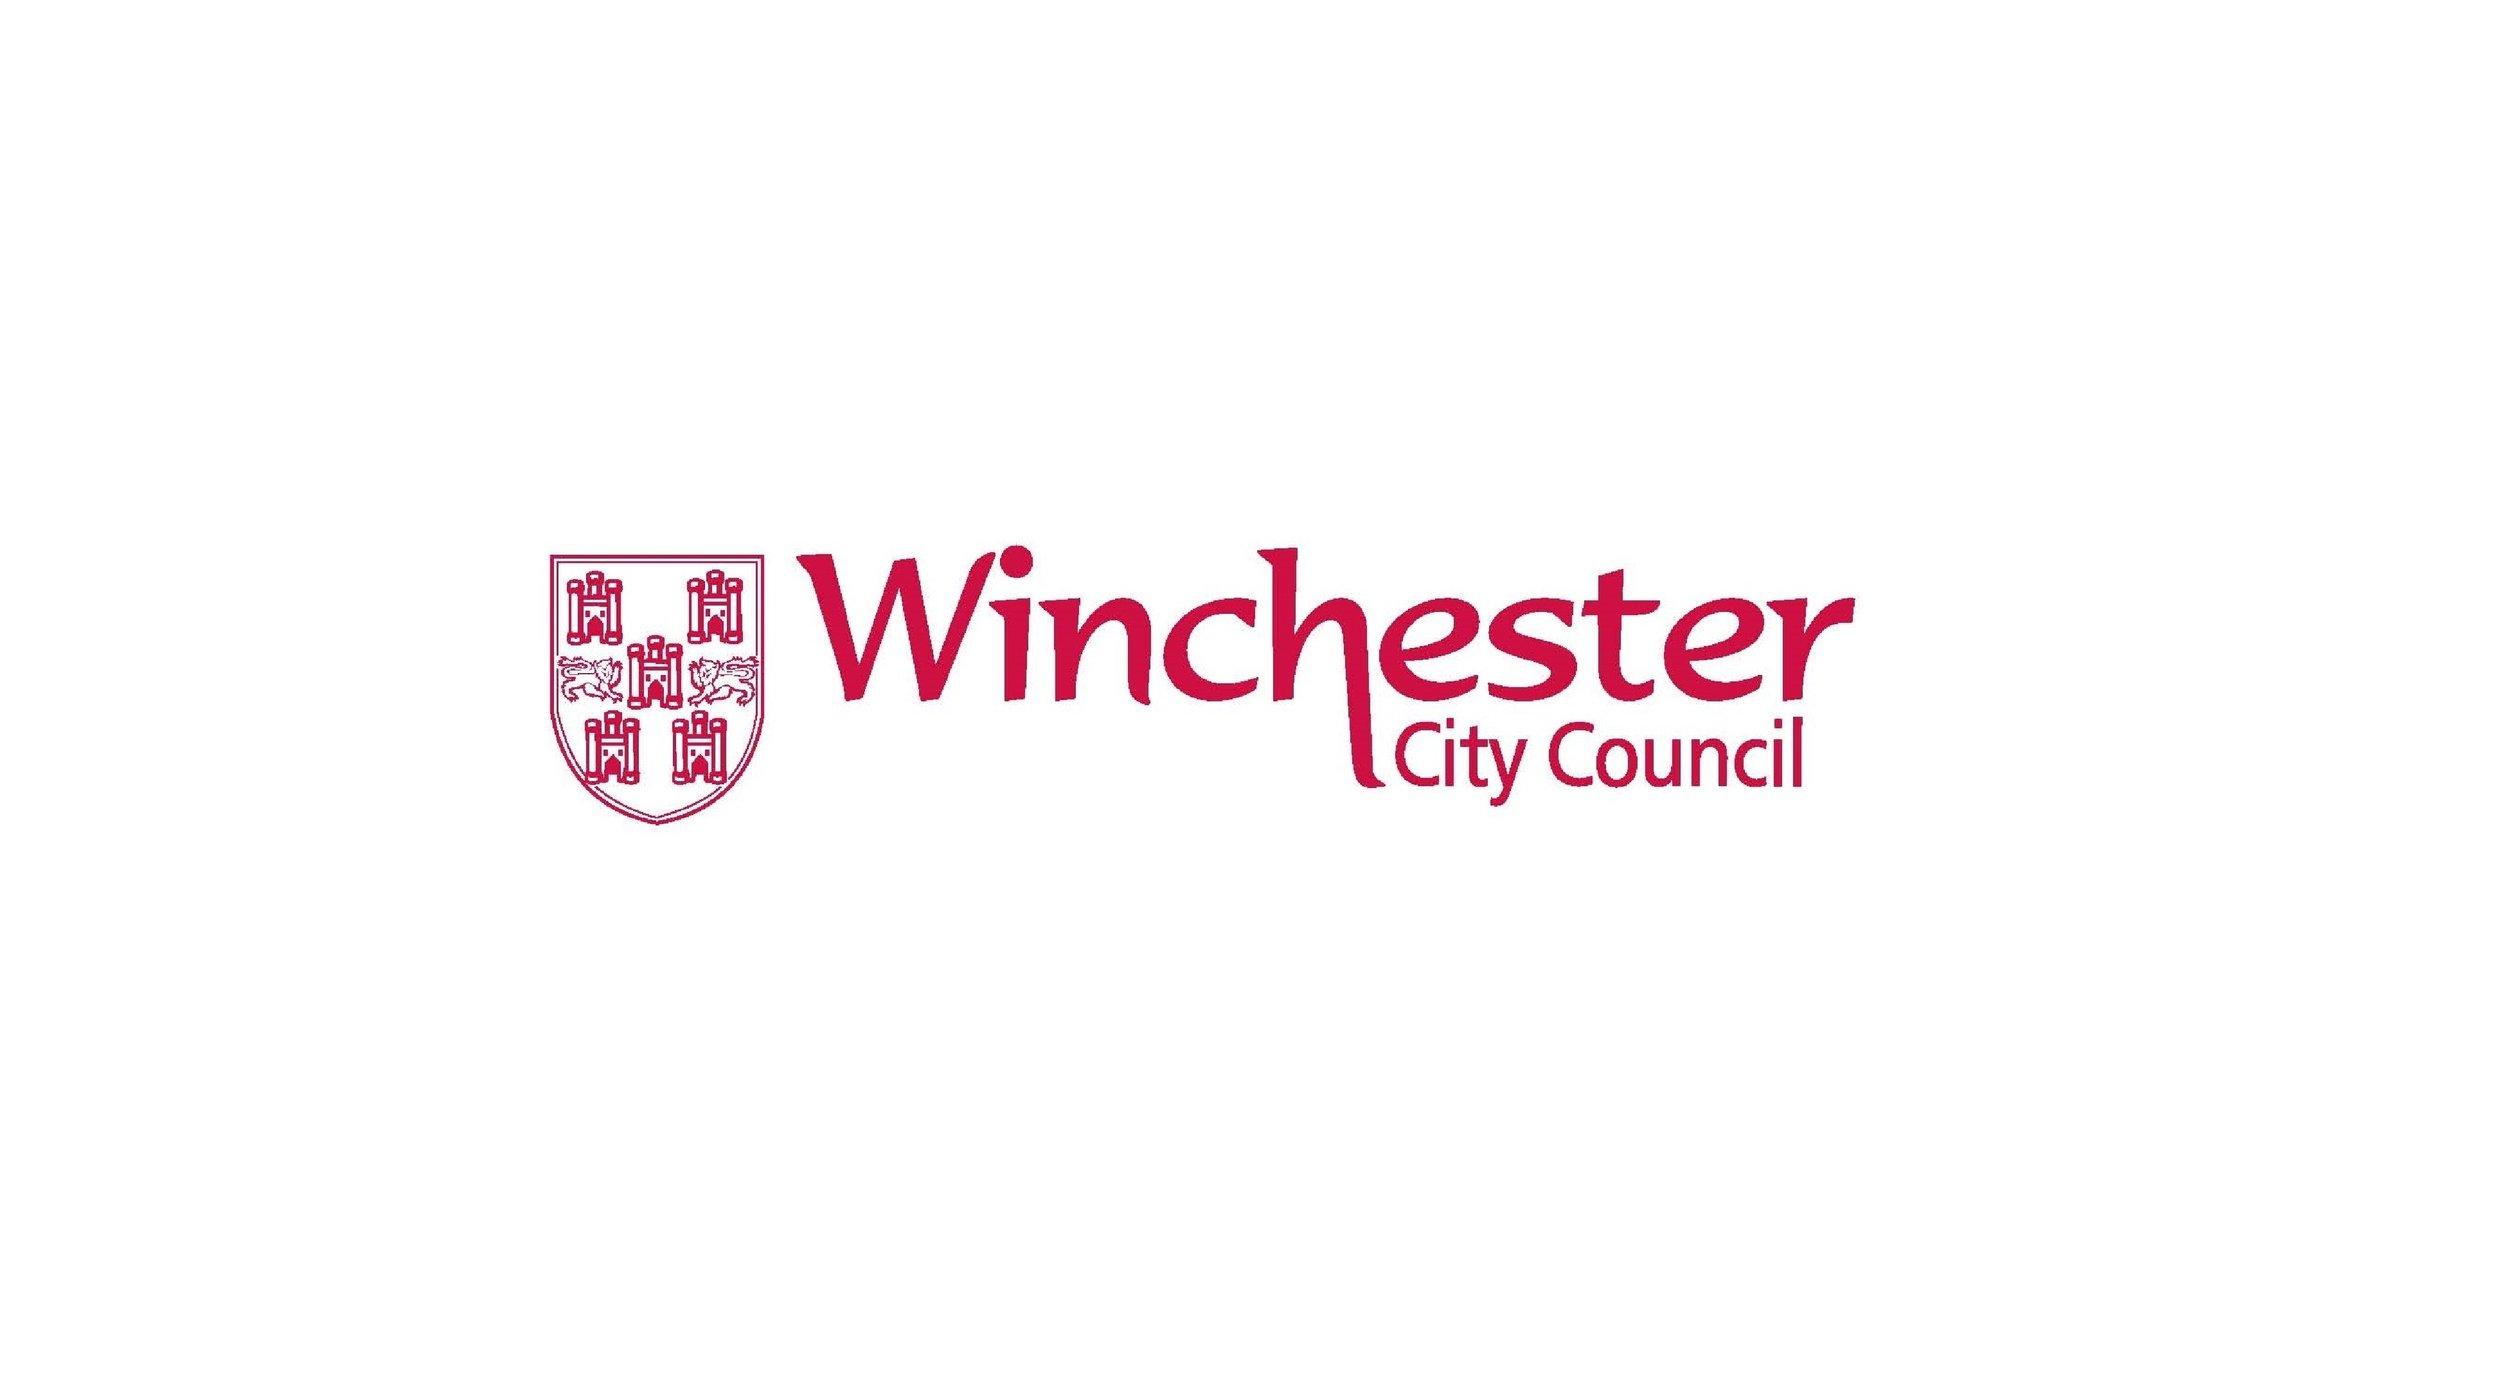 winchester city council.jpg